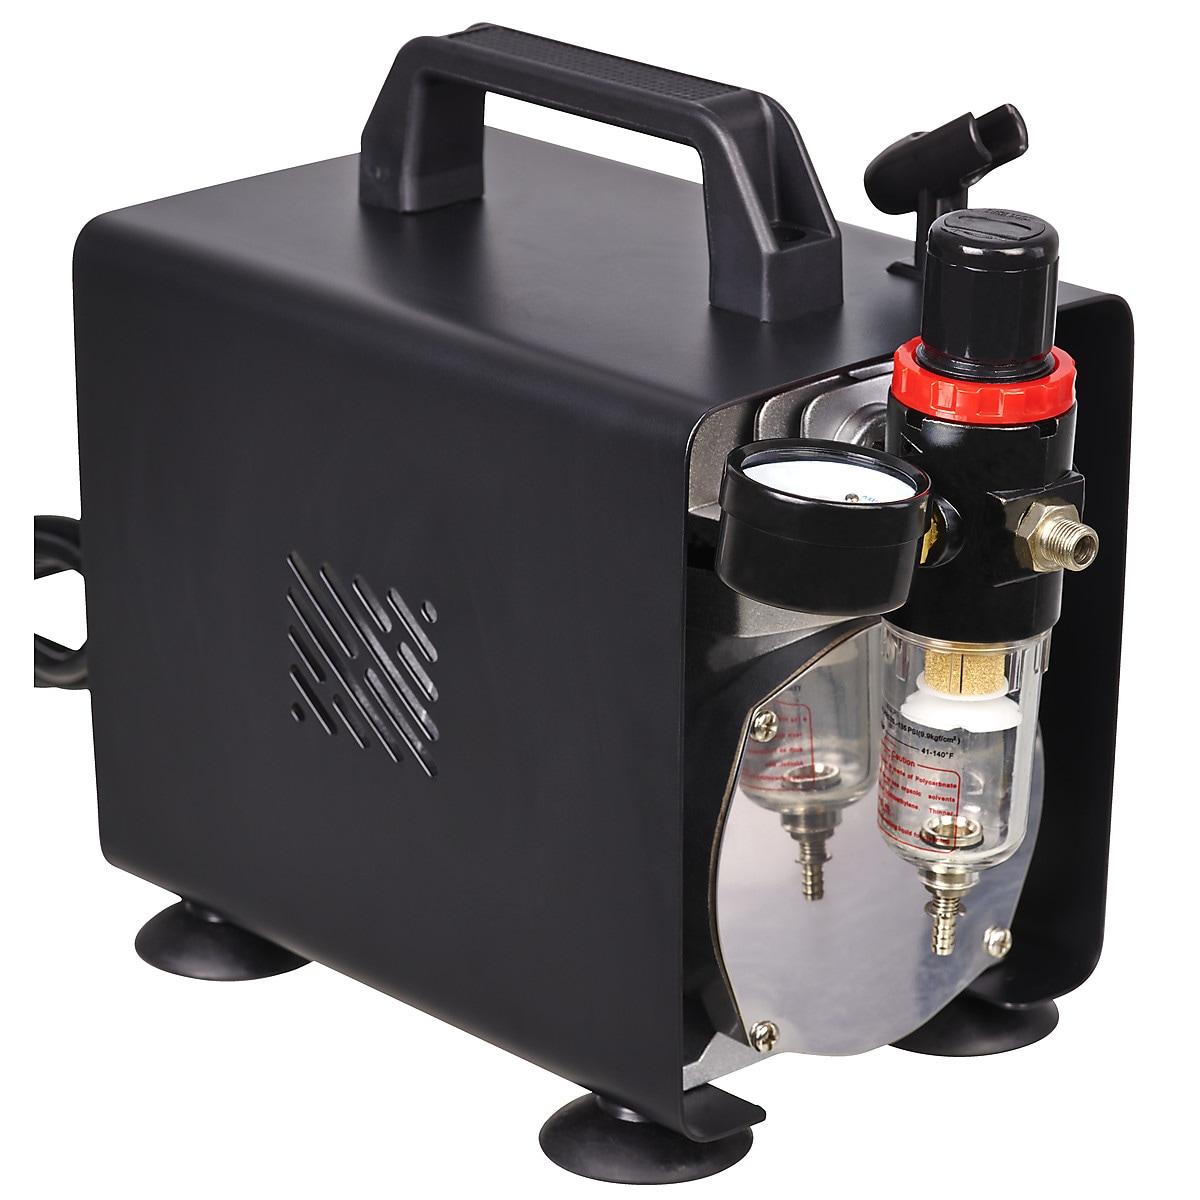 Airbrushkompressor Cocraft